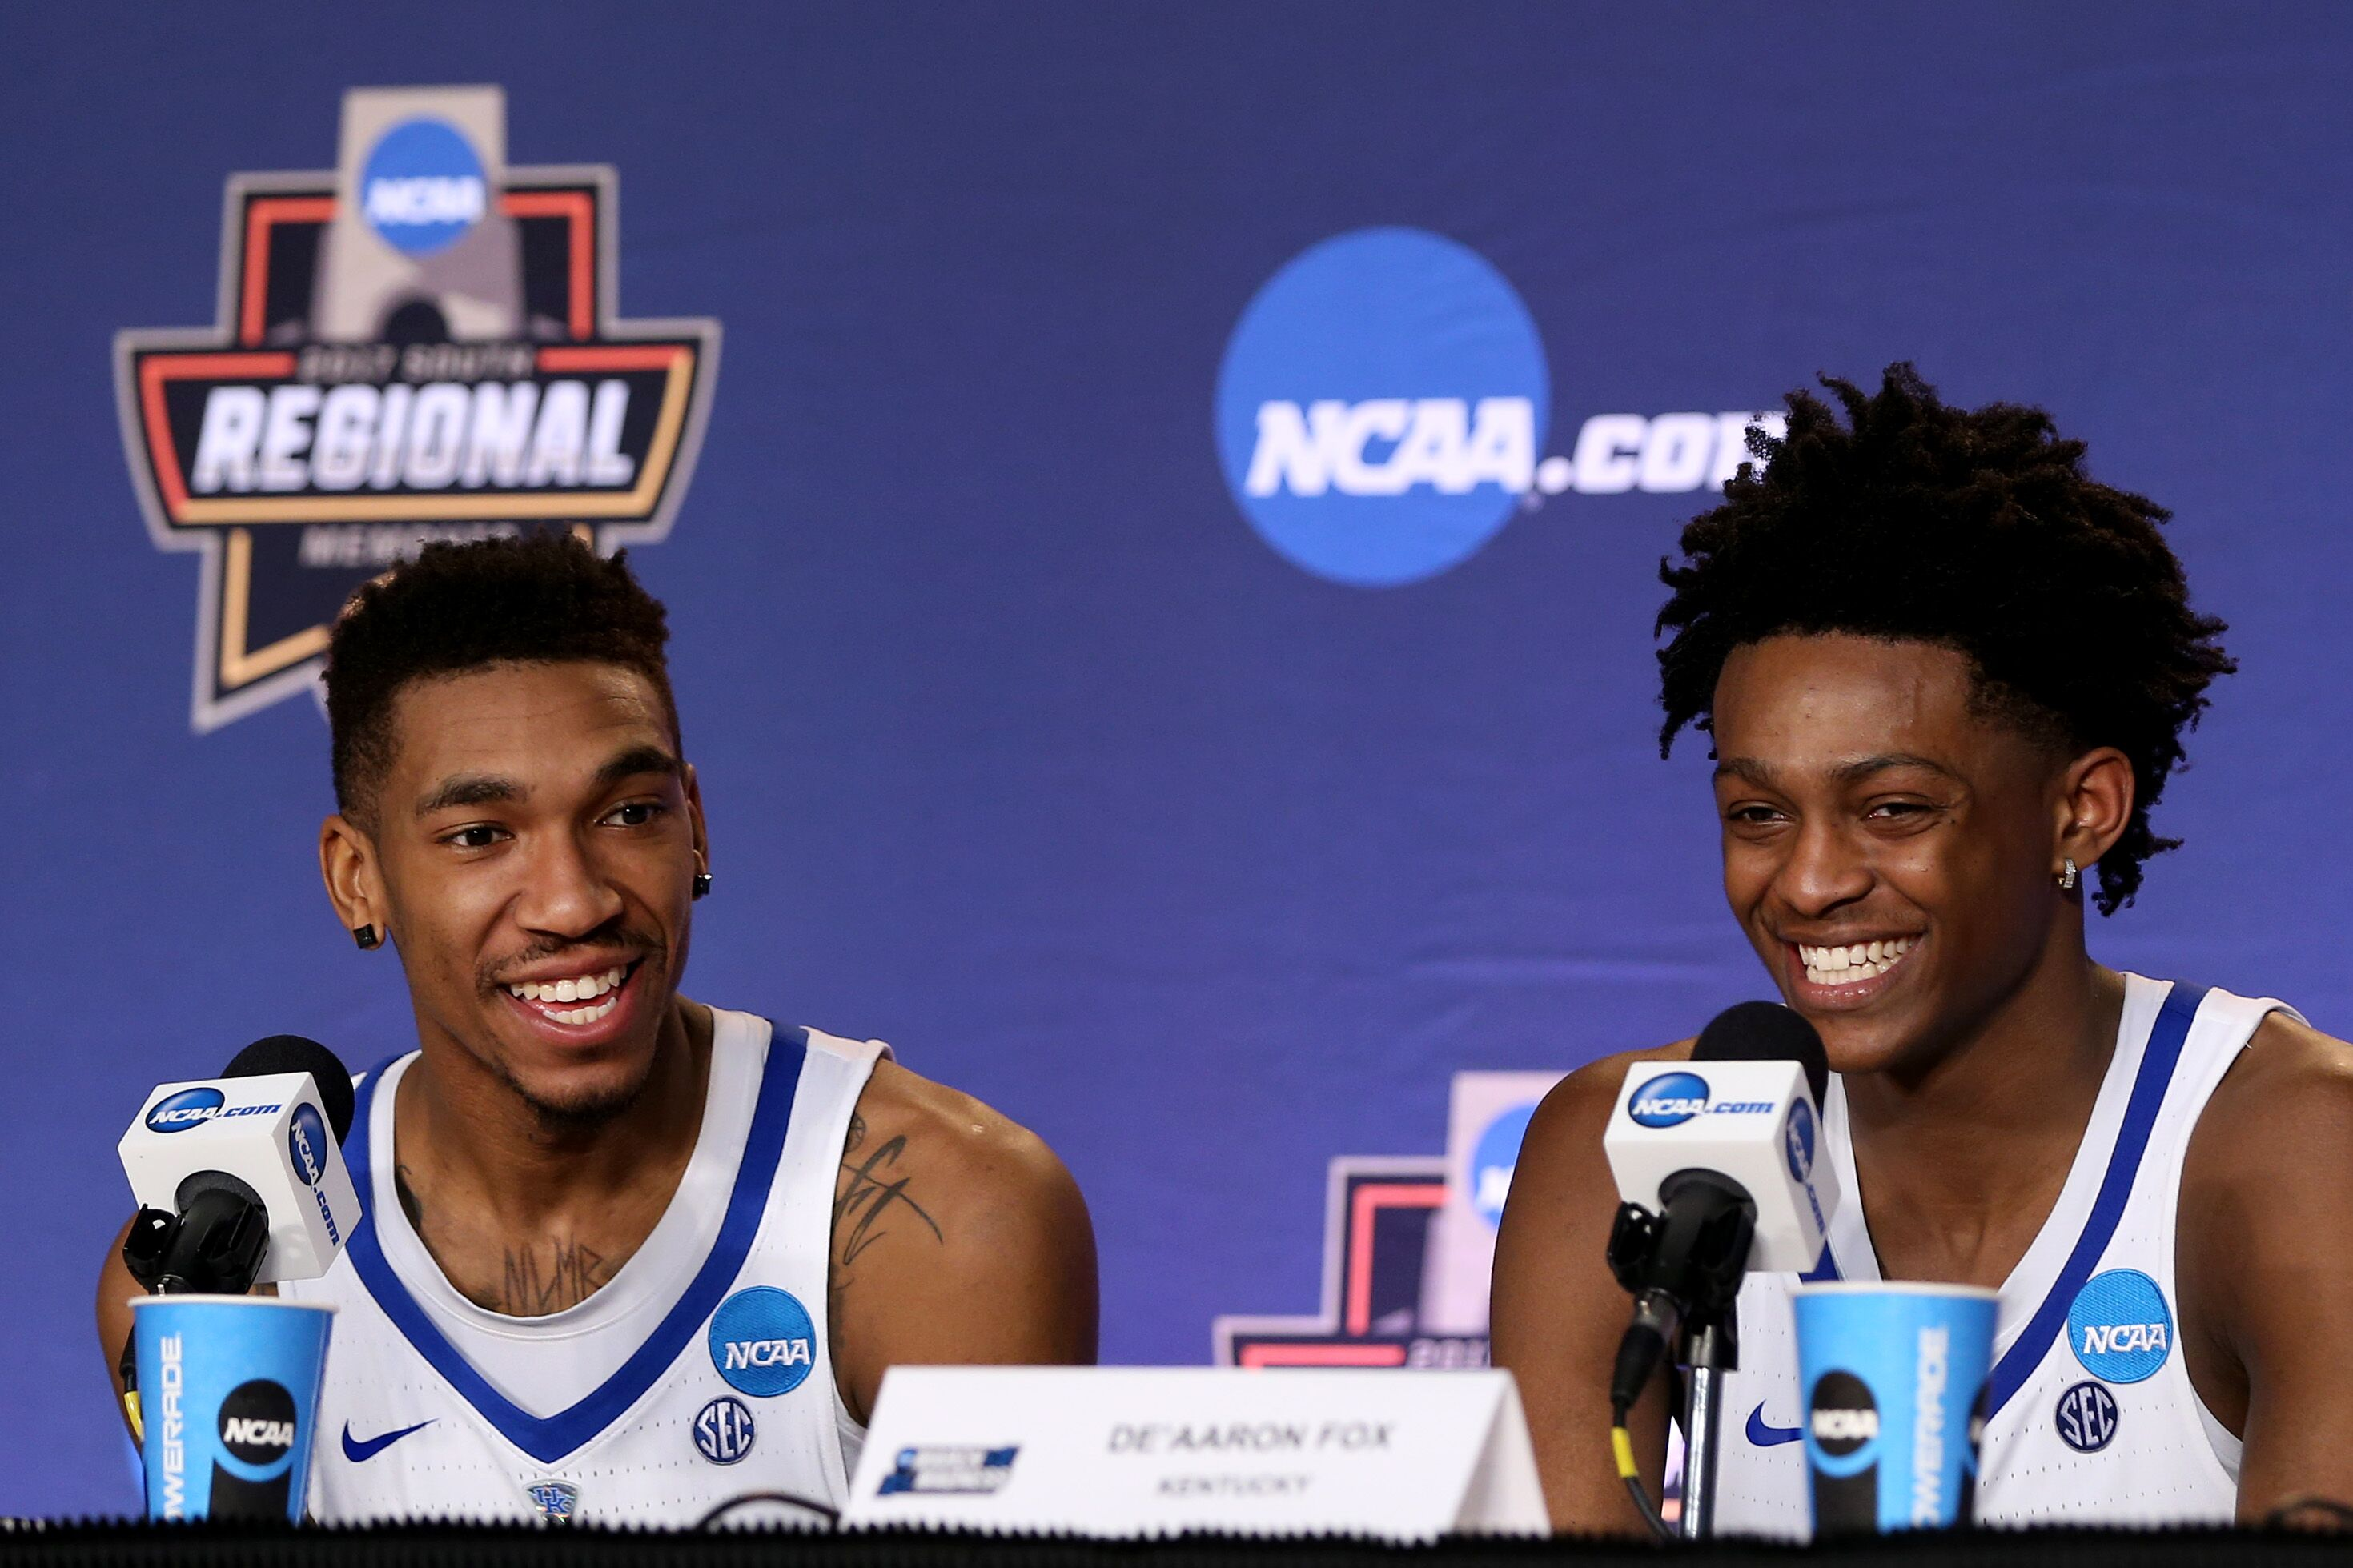 Malik Monk And De Aaron Fox Usa Today All Americans: Kentucky Basketball: De'Aaron Fox And Malik Monk Declare